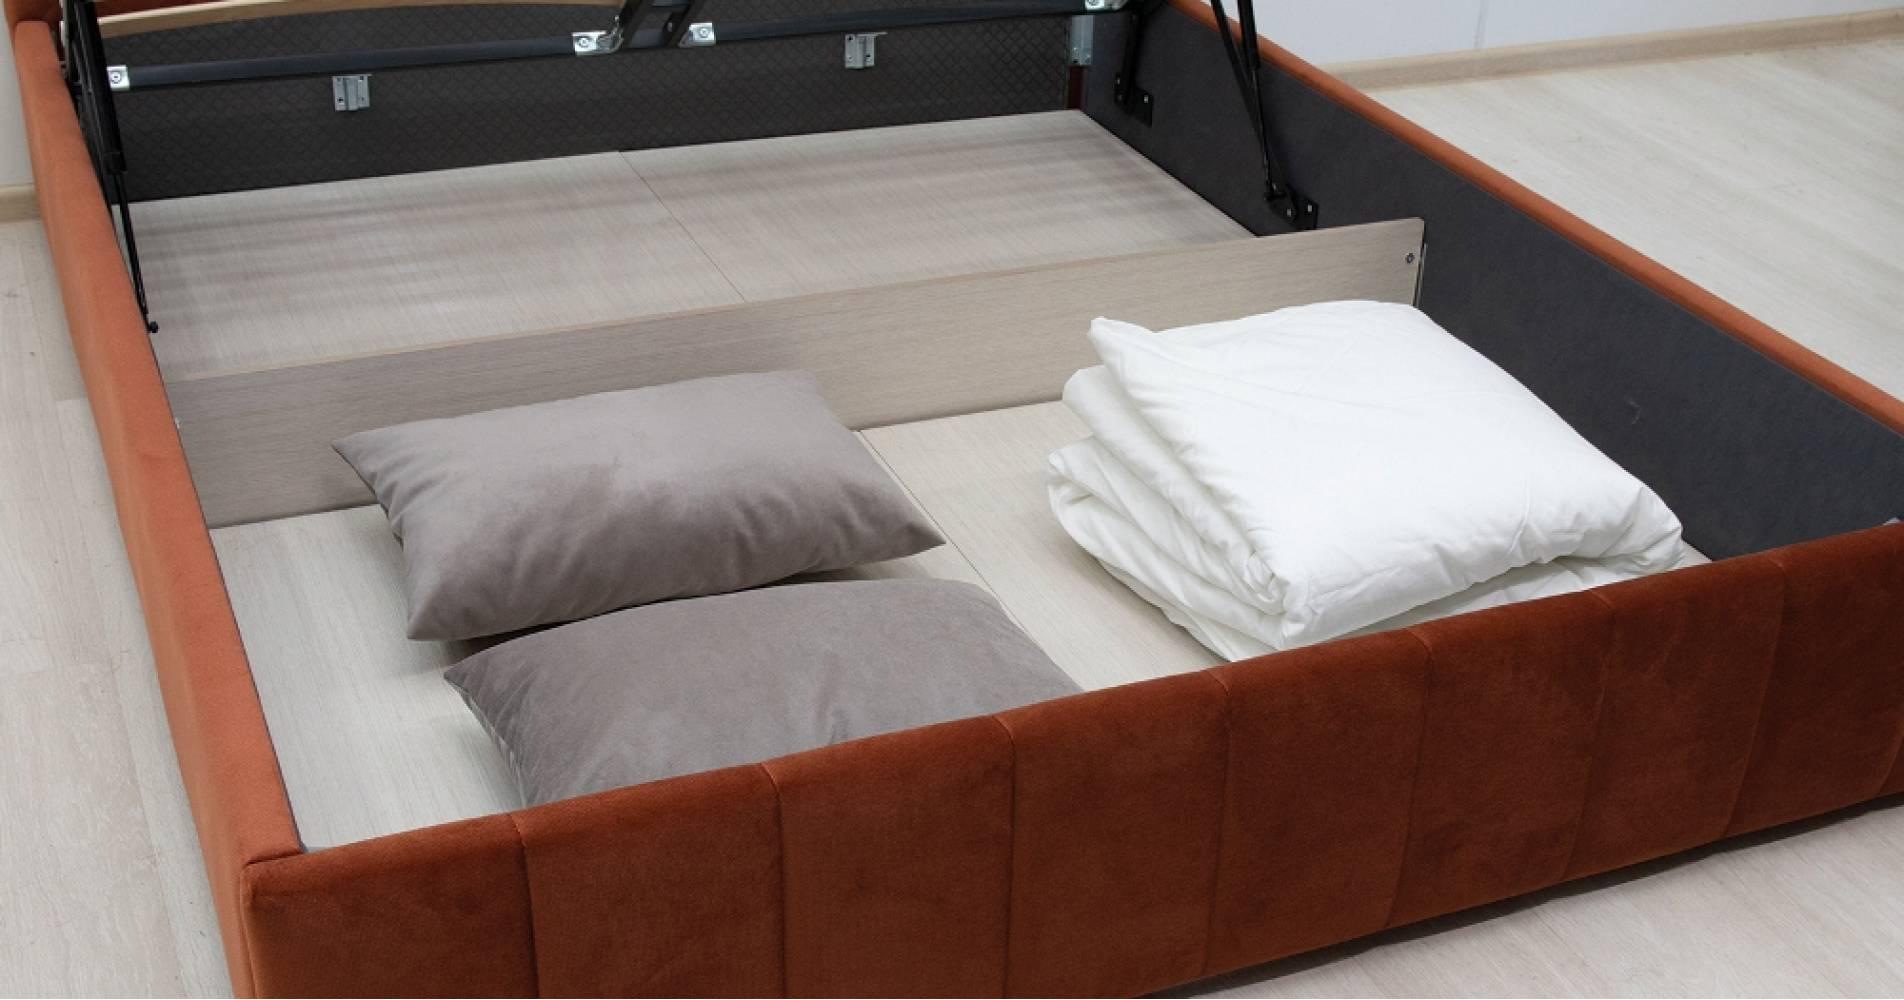 Дно кроватное 1600 Стандарт ЛДСП для кровати МИЛАНА (Лекко терра)